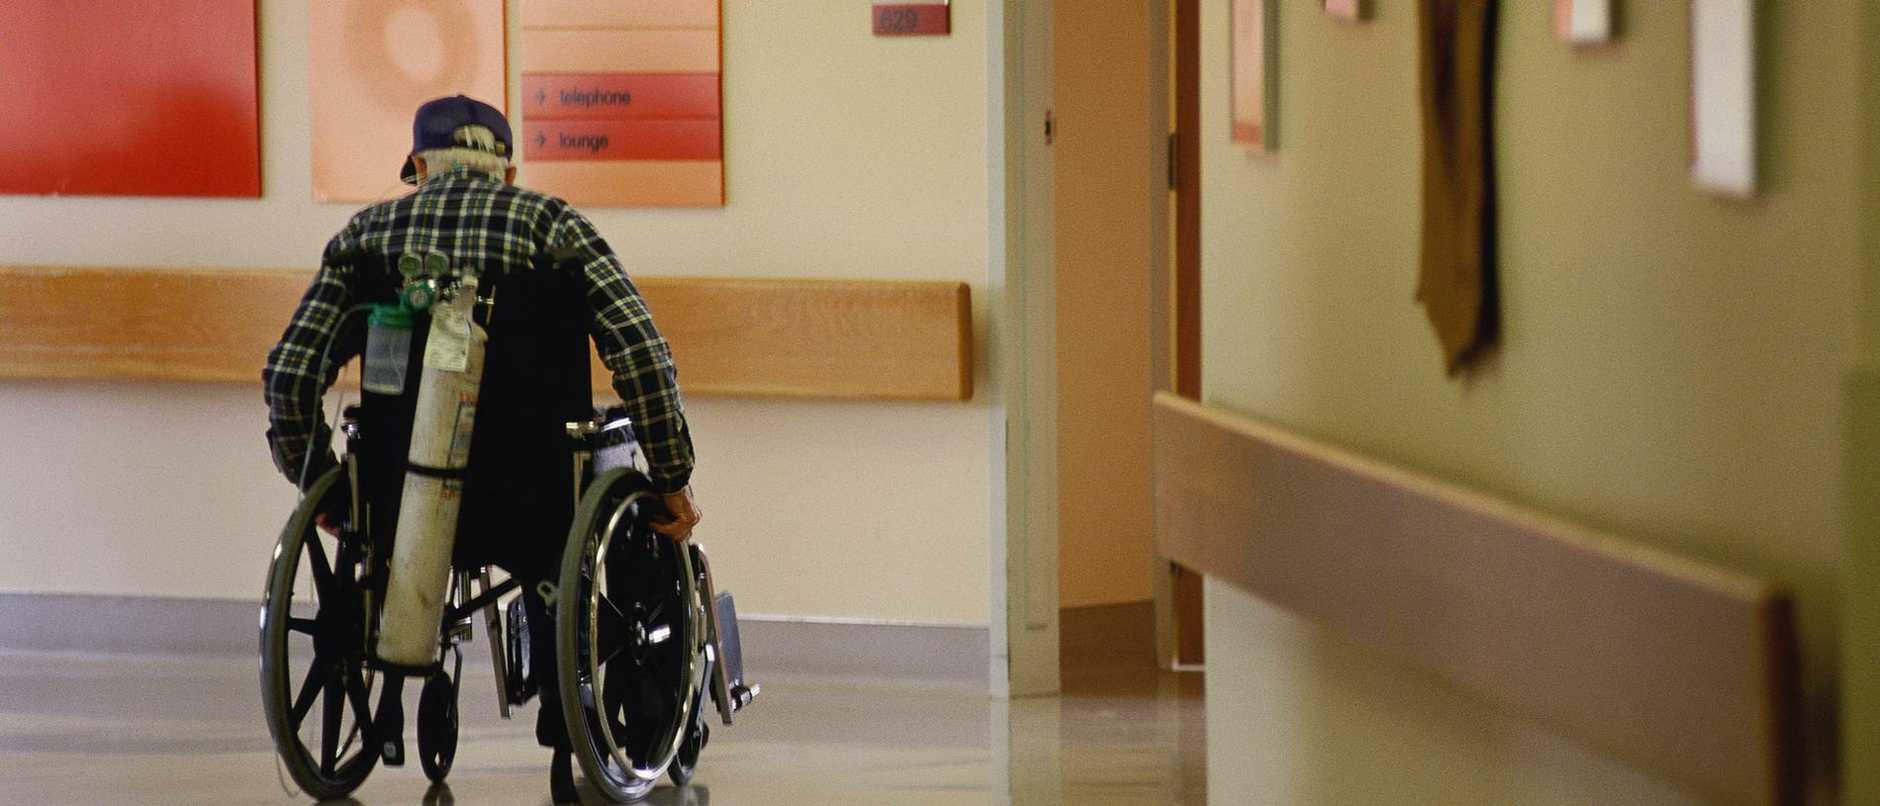 AGED CARE .. Elderly man in hospital corridor in wheelchair, oxygen tank on back